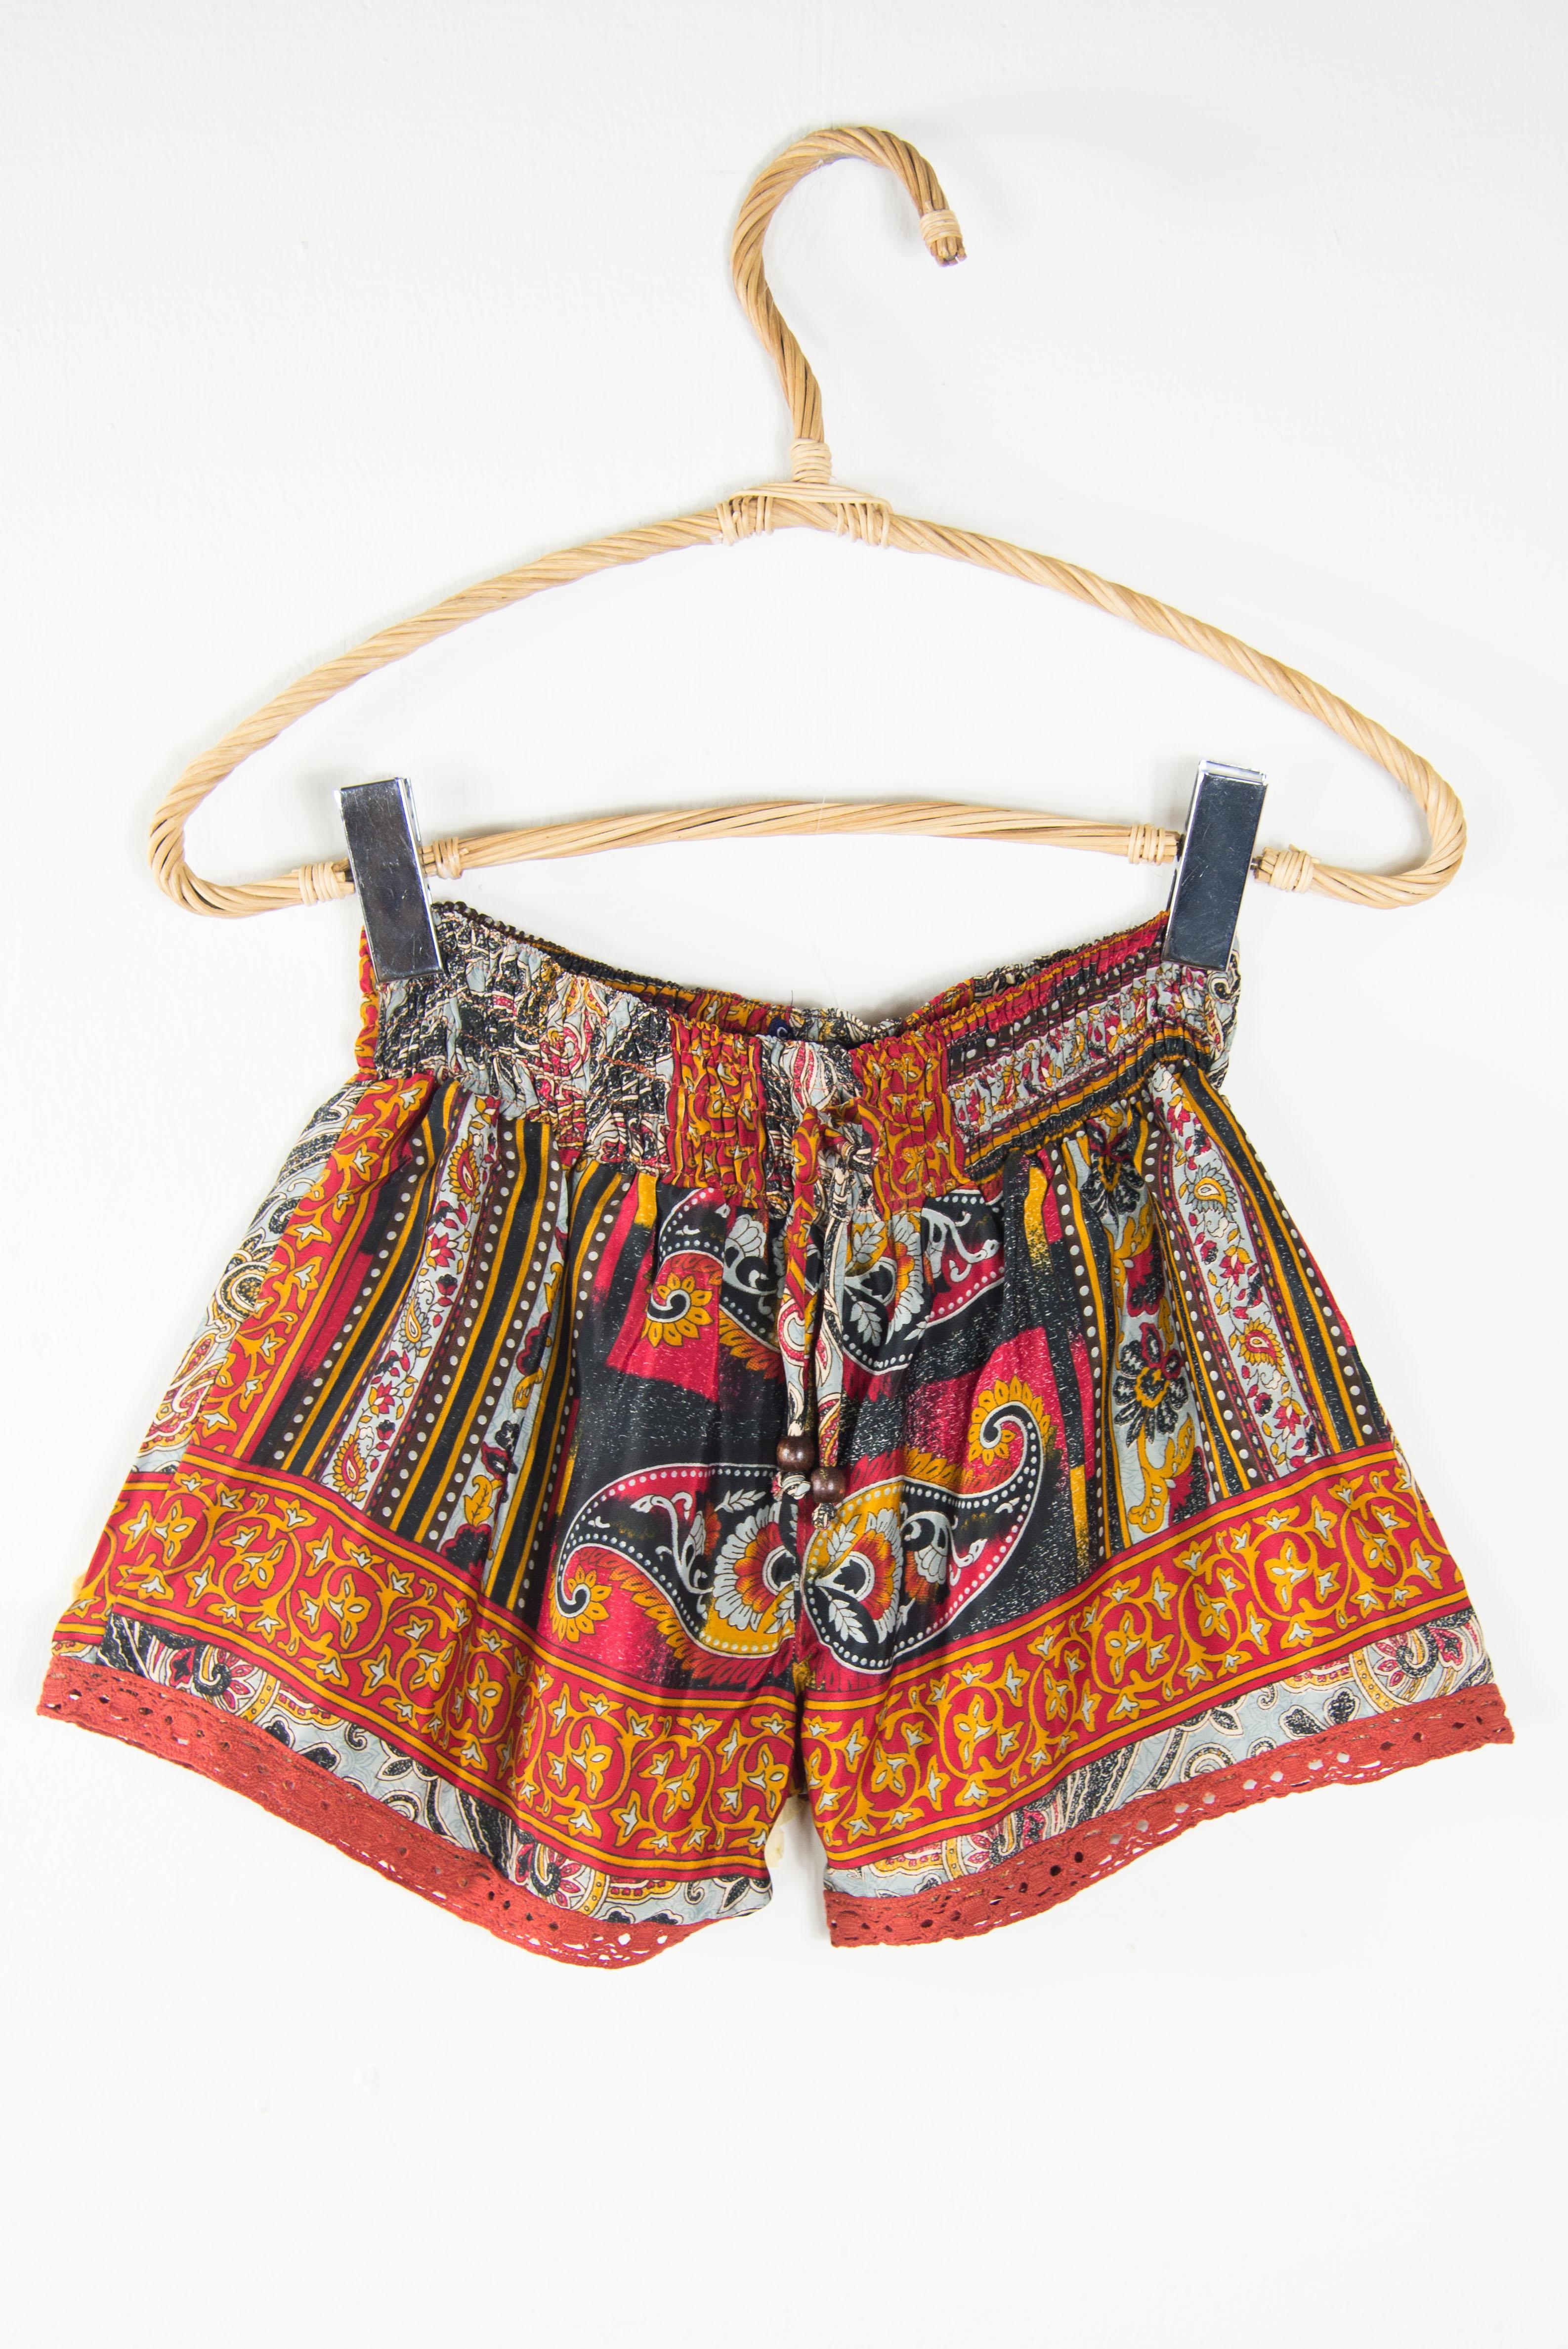 Women's short trousers. Short for sale online